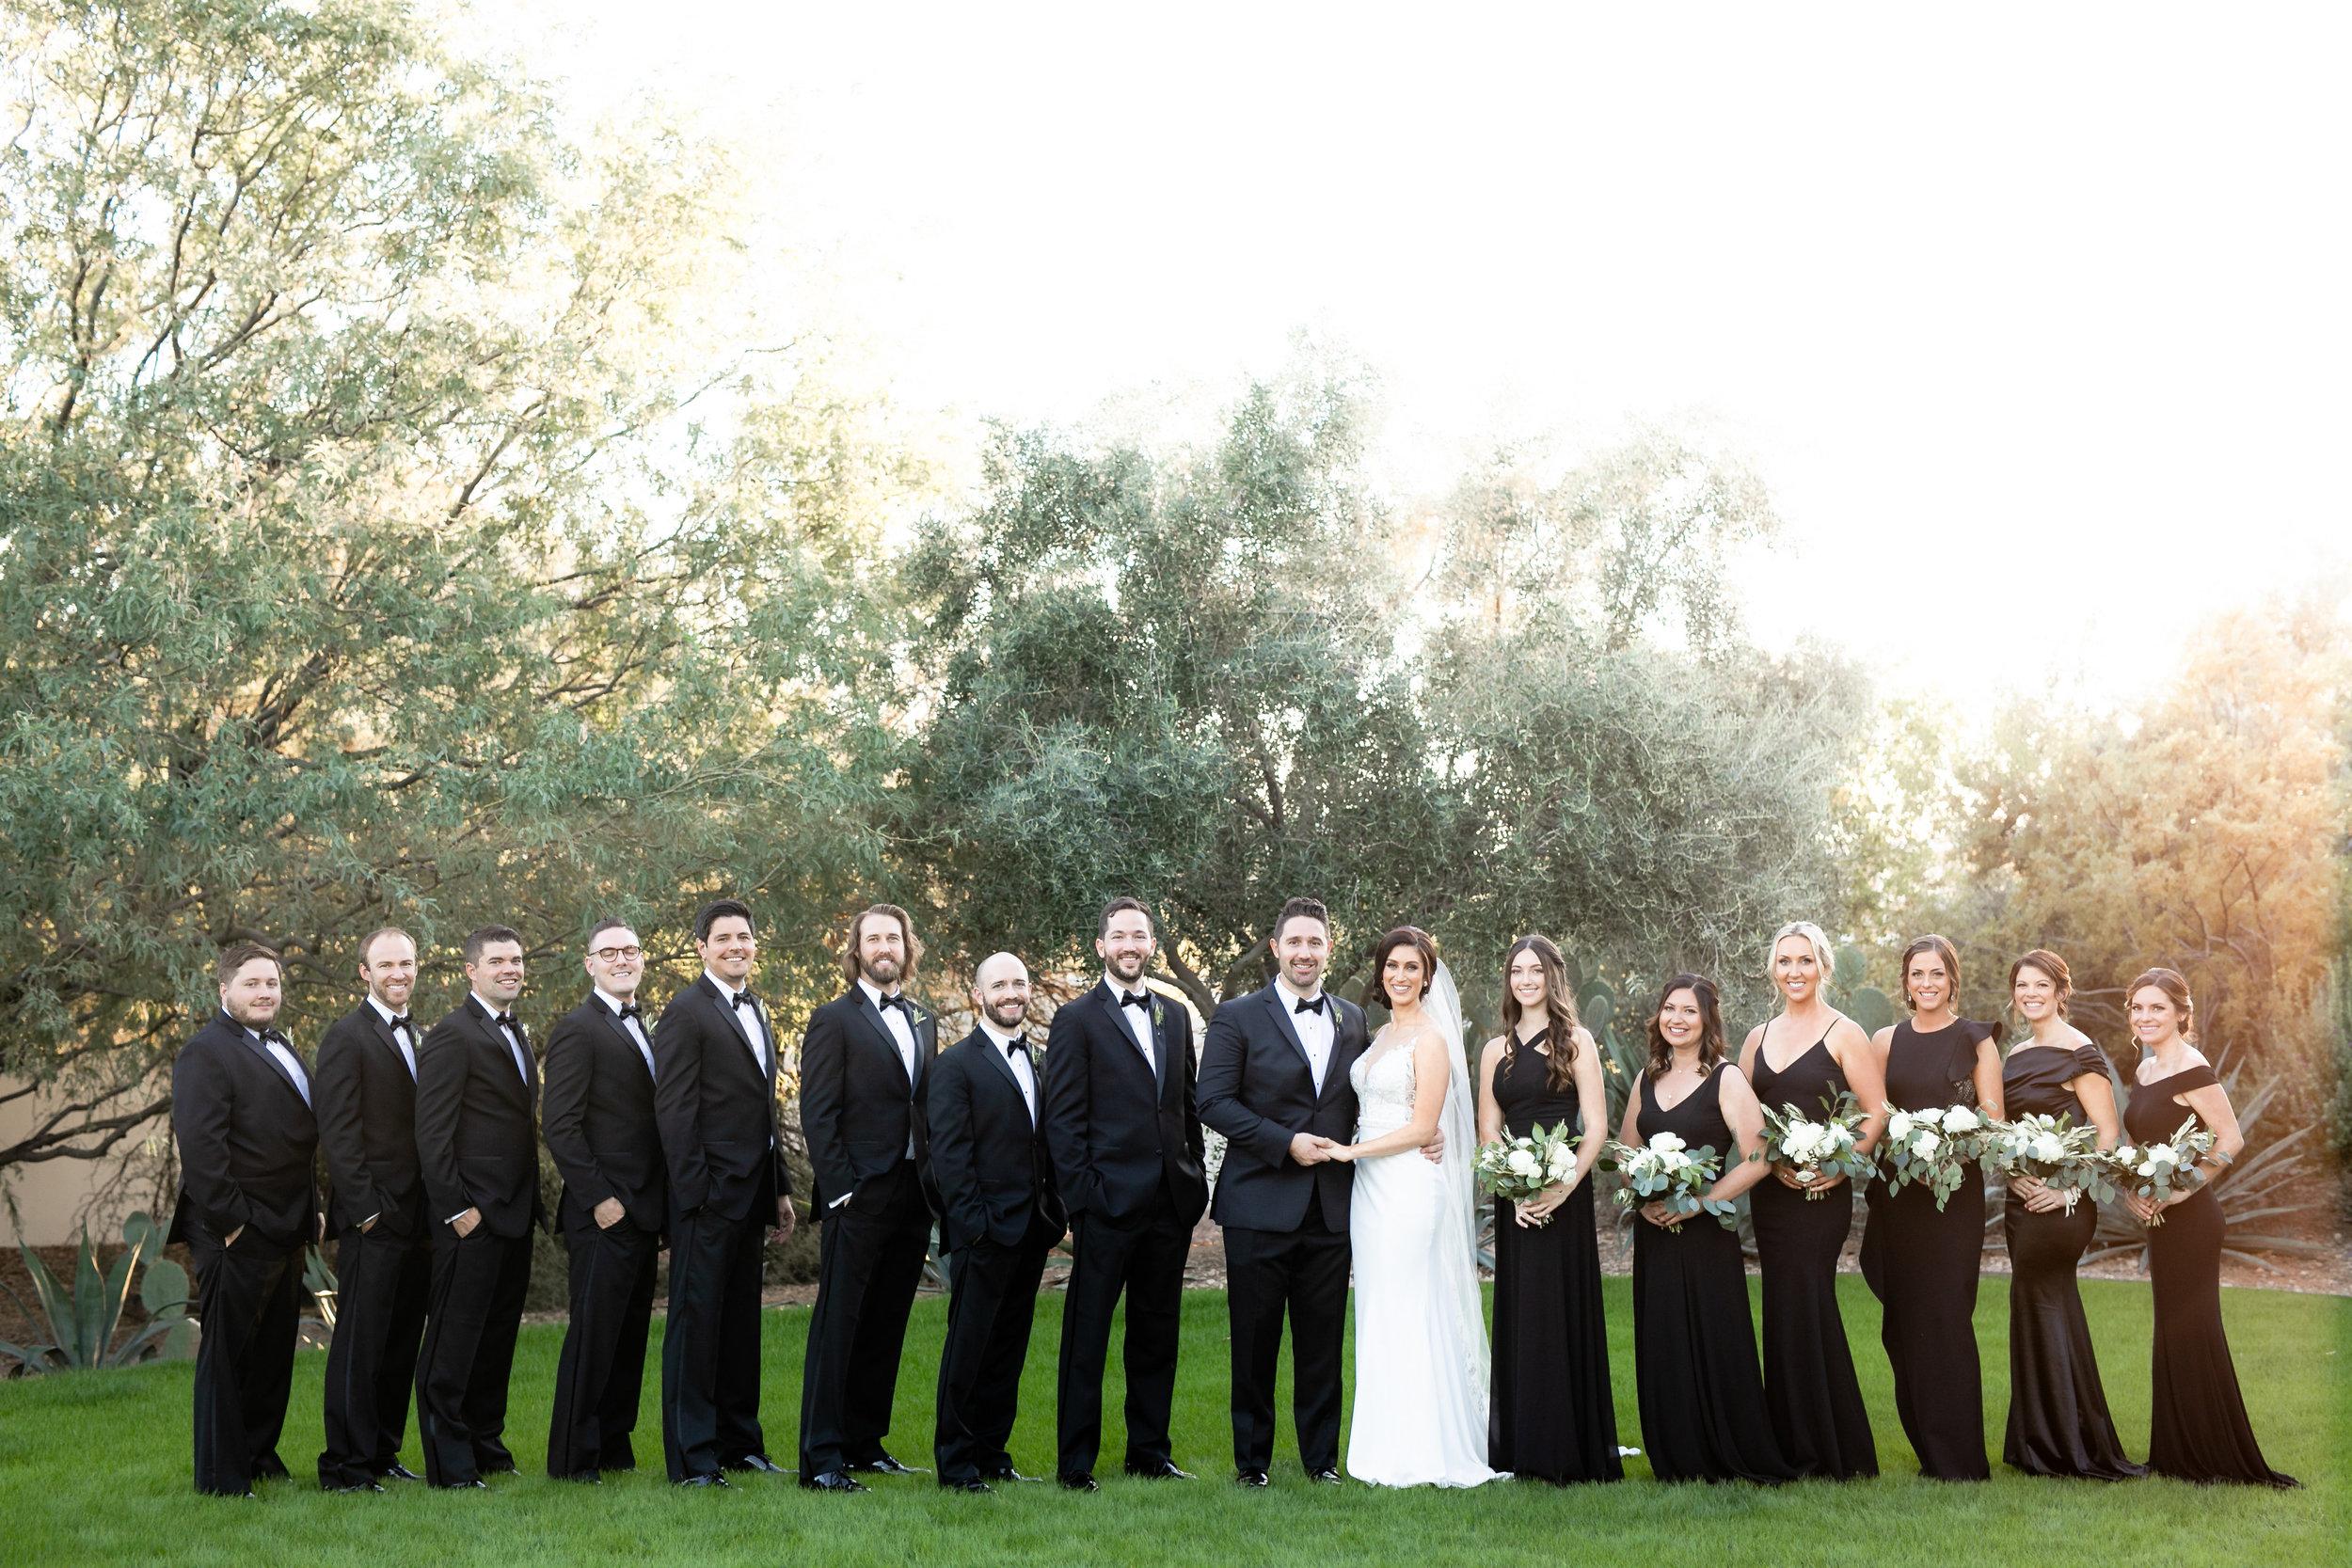 Nick and Erica Wedding at El Chorro-0575.jpg